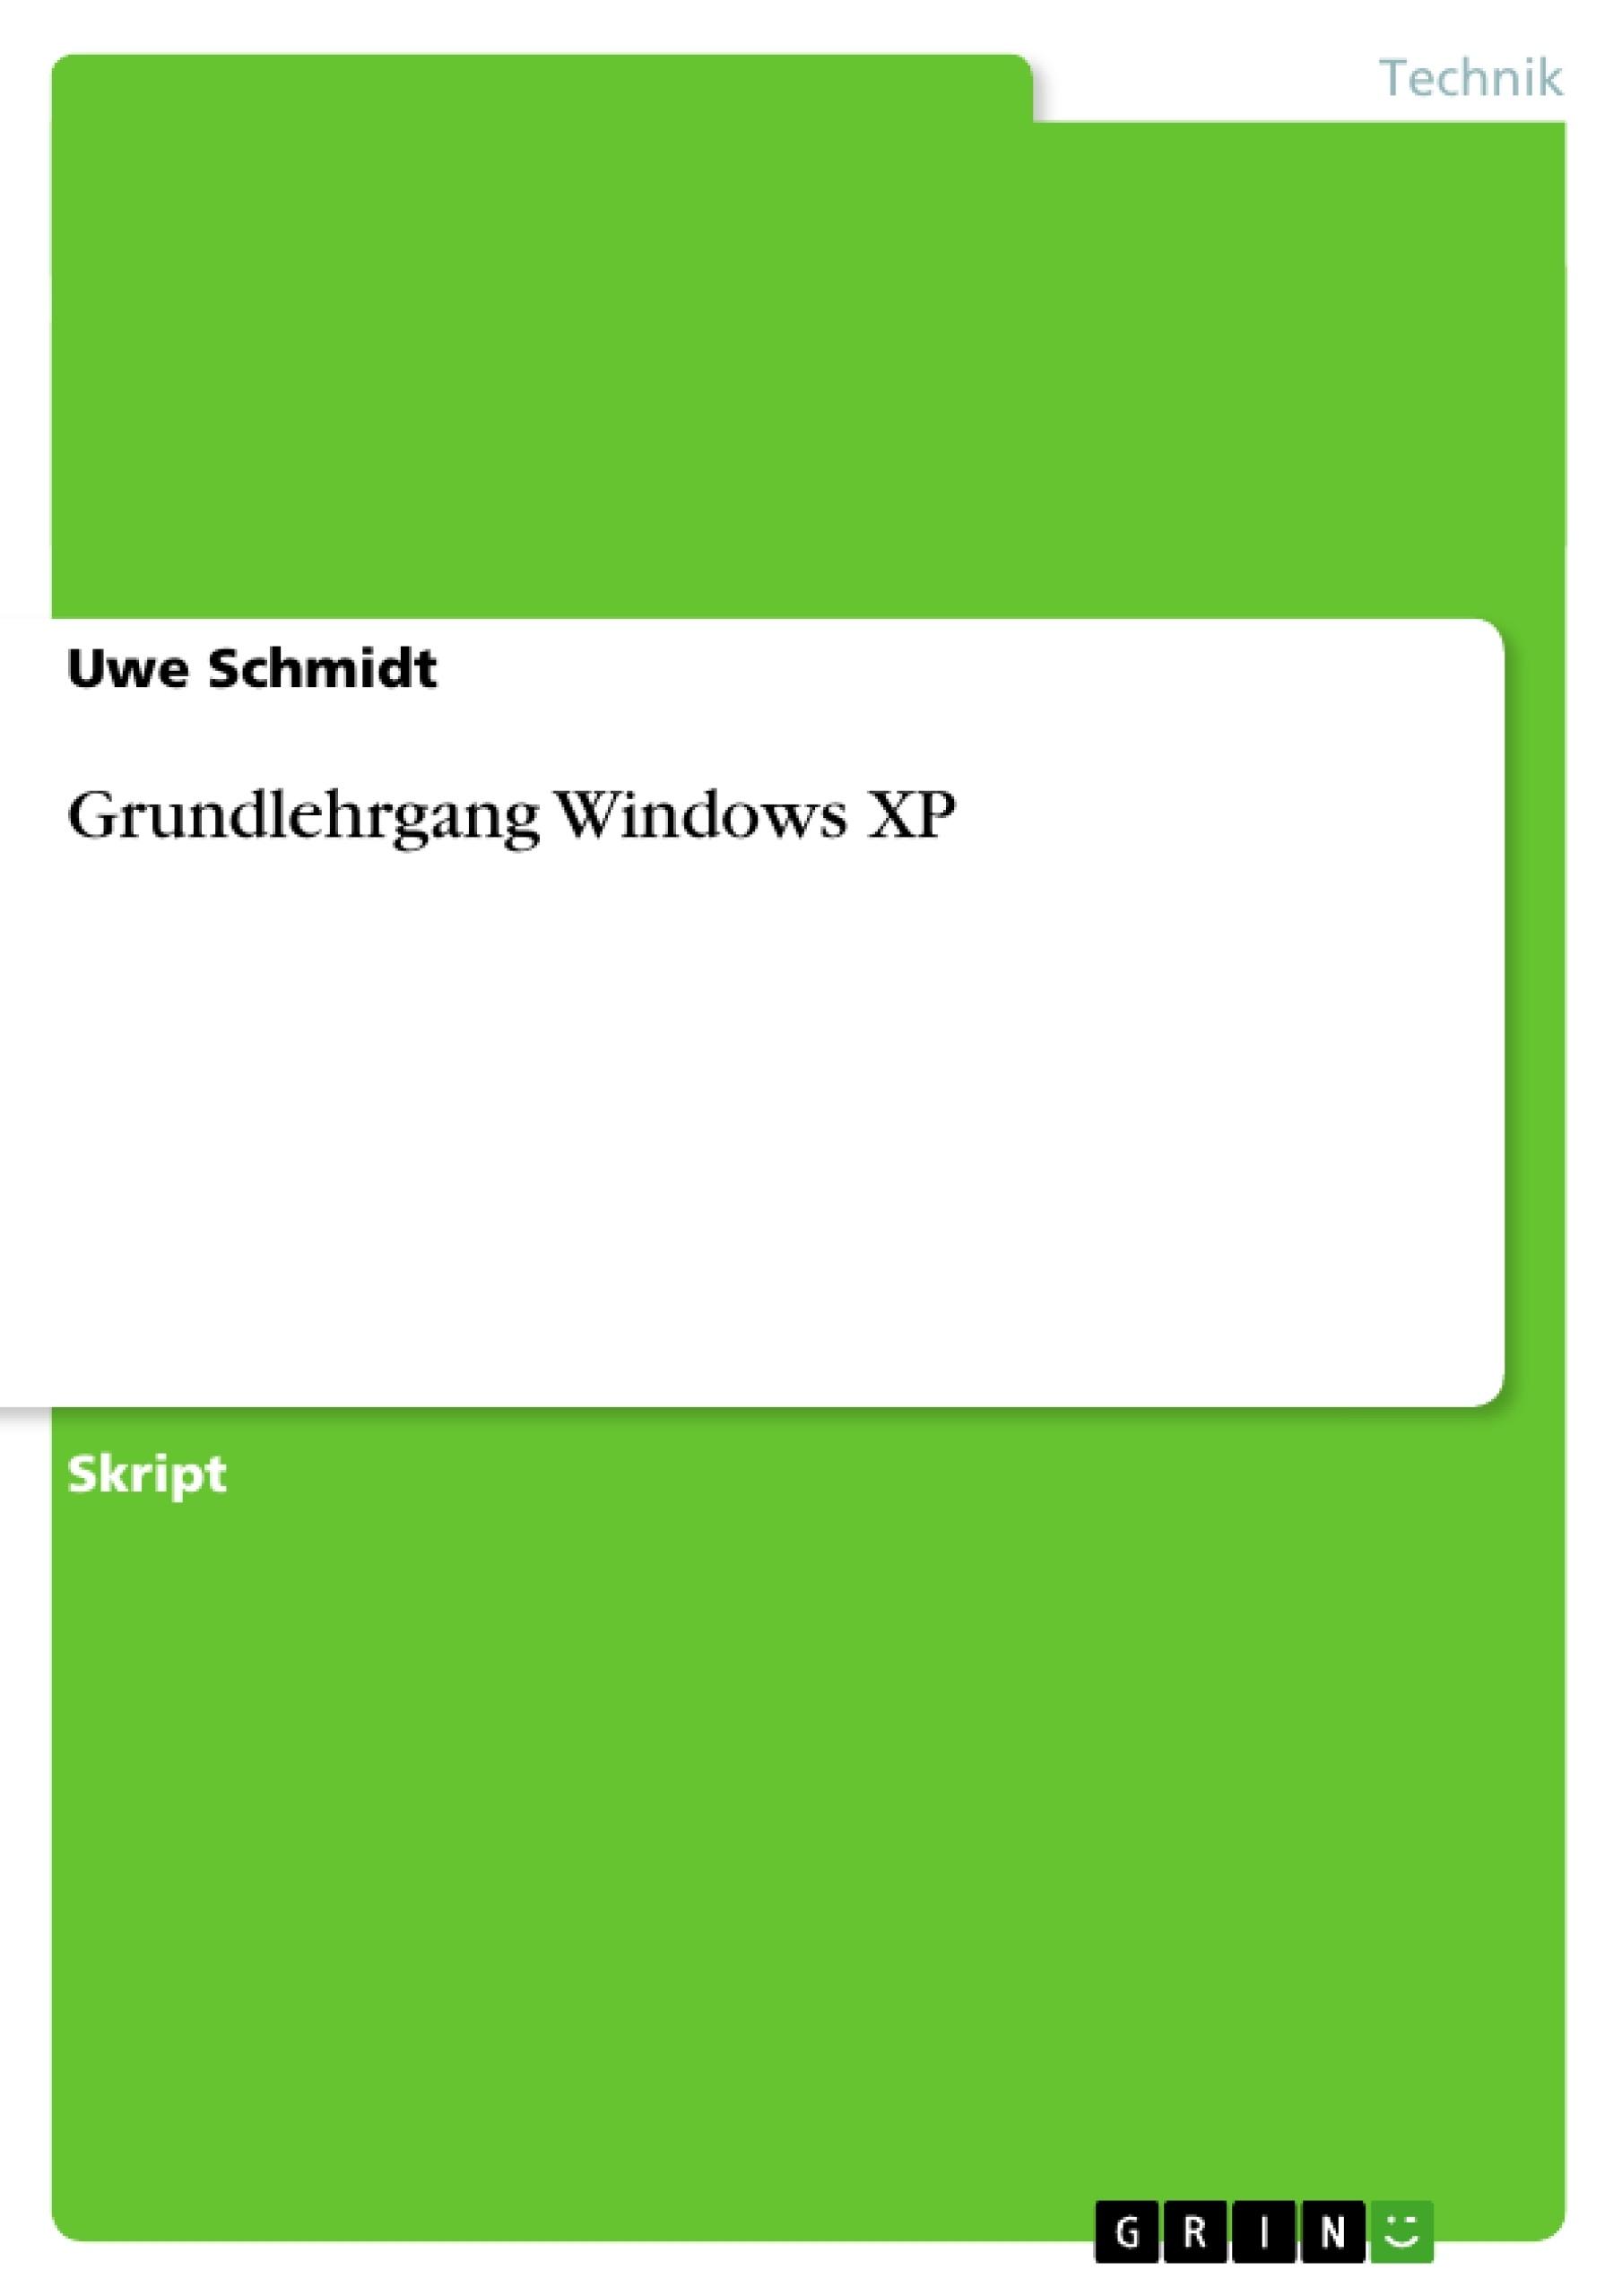 Titel: Grundlehrgang Windows XP